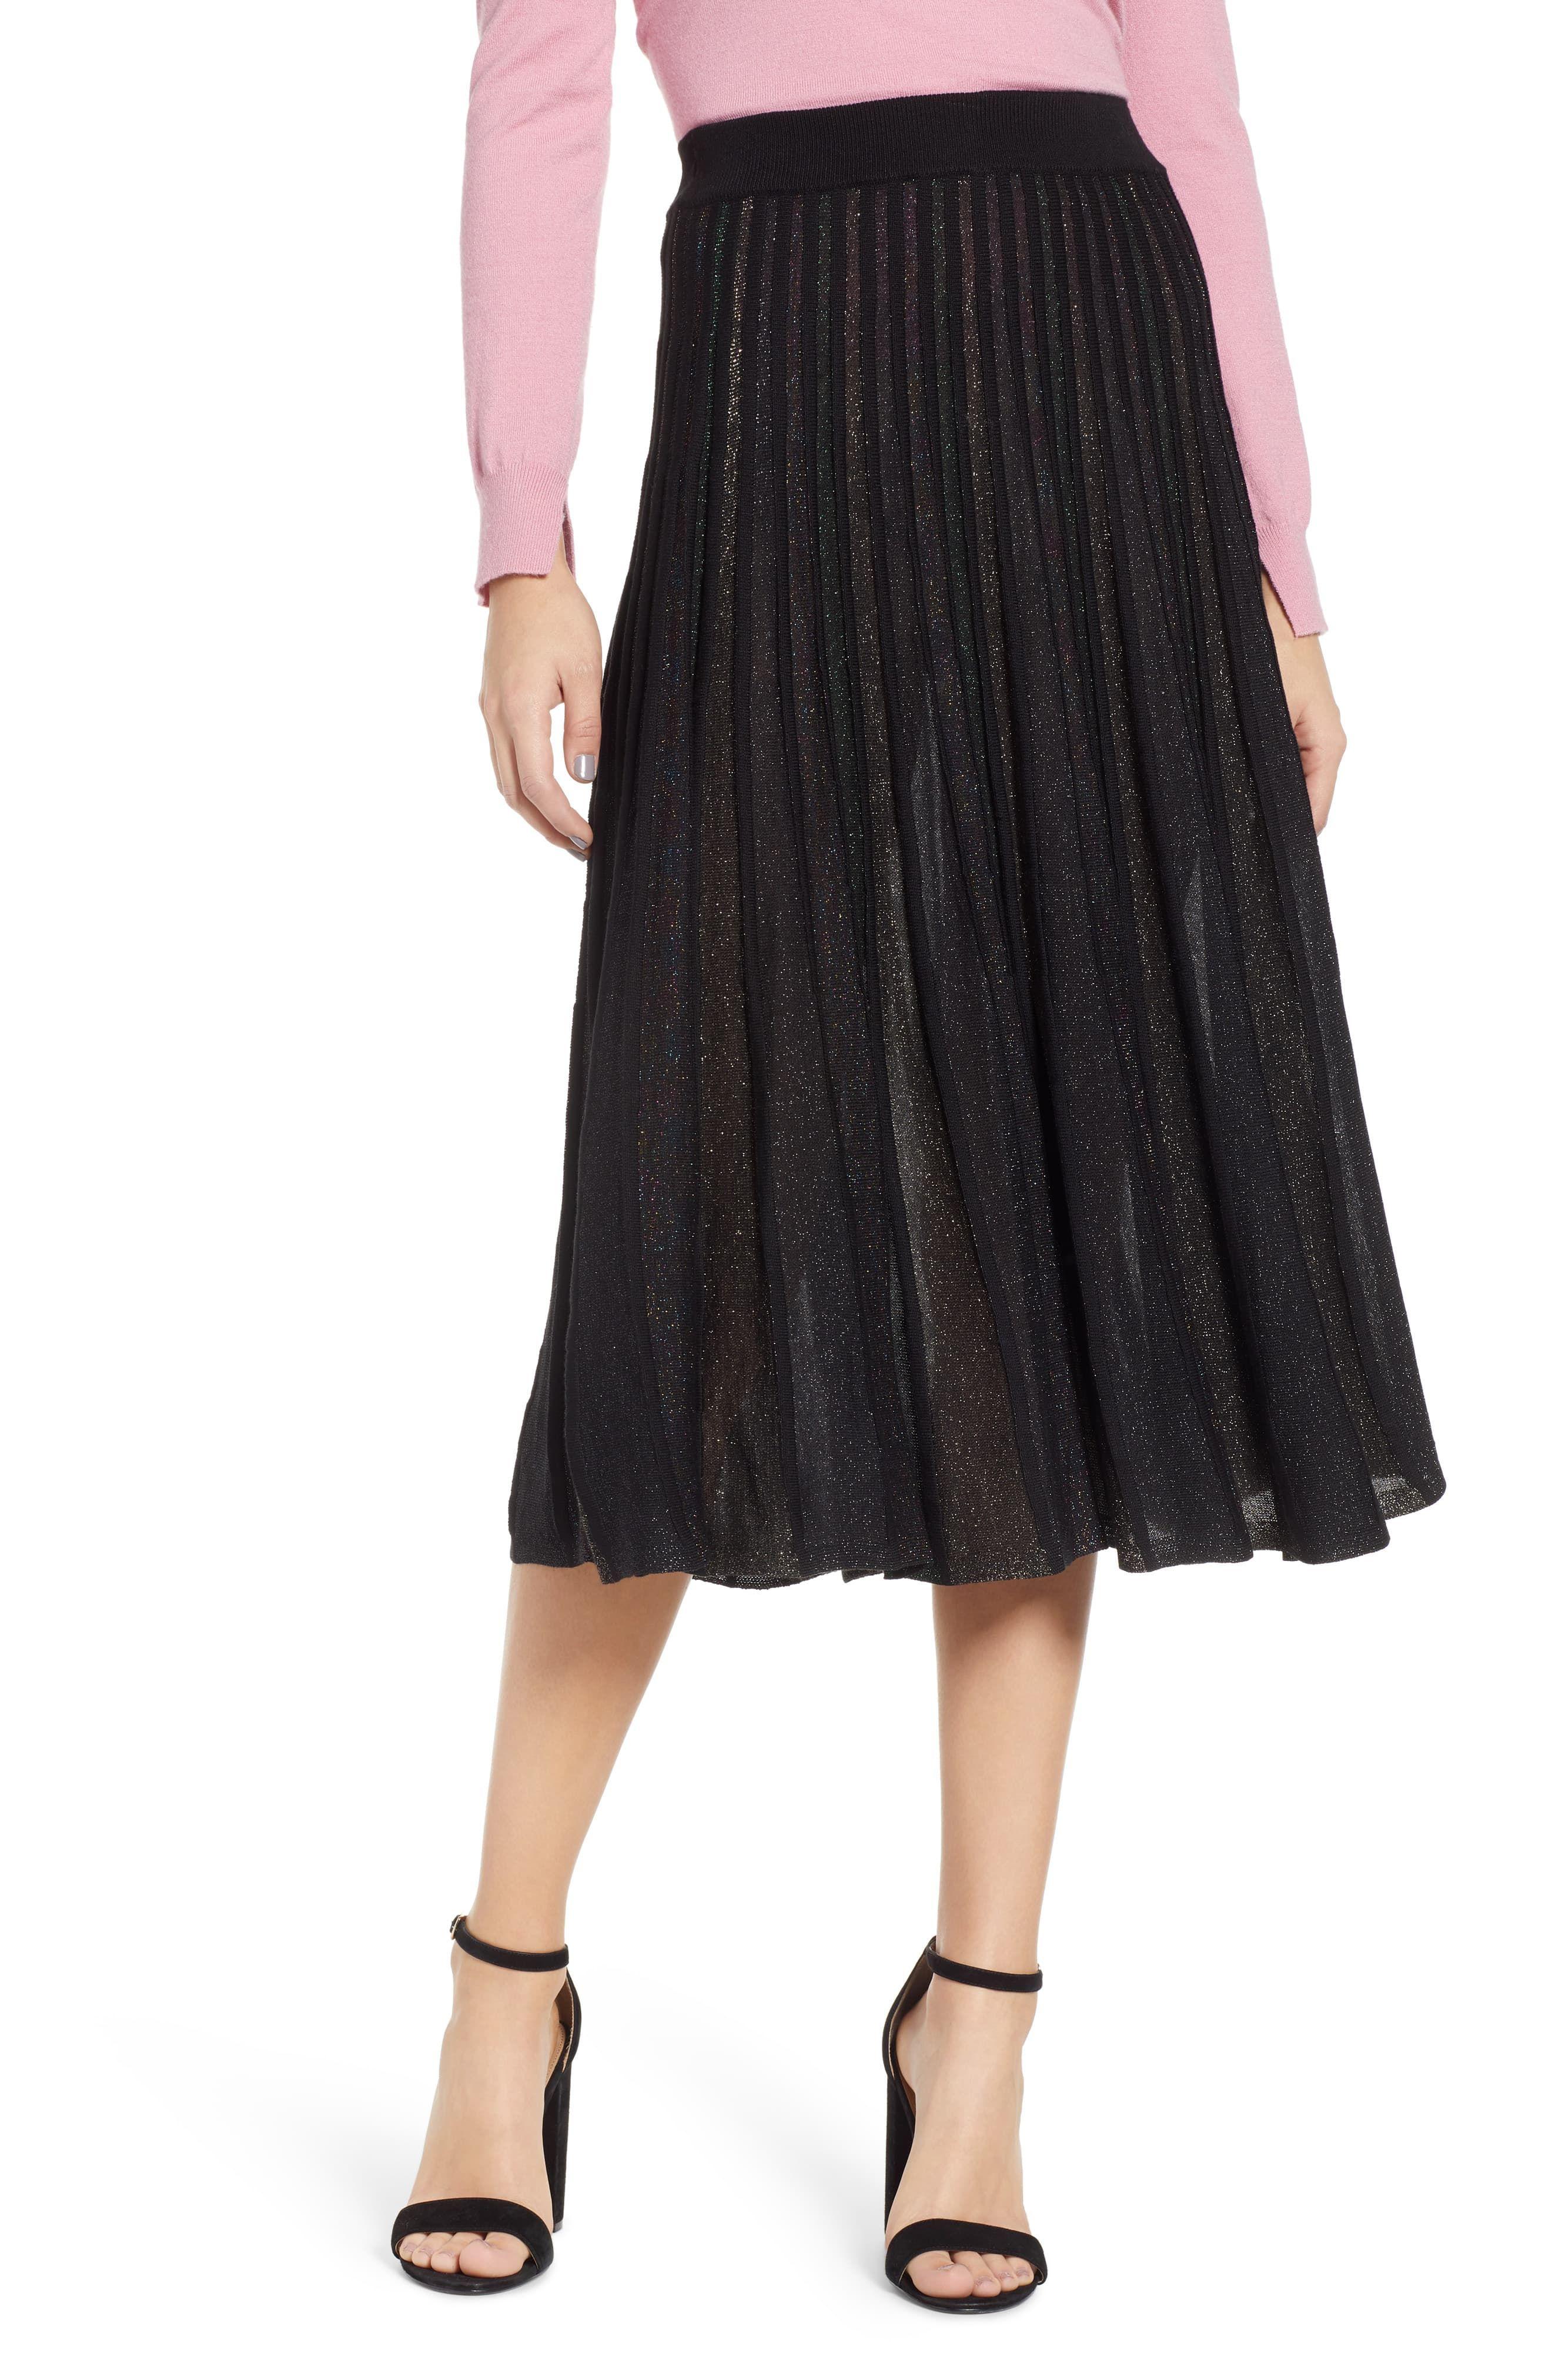 e509d4195 Women's Prima Sparkle Pleated Midi Skirt, Size Small - Black ...